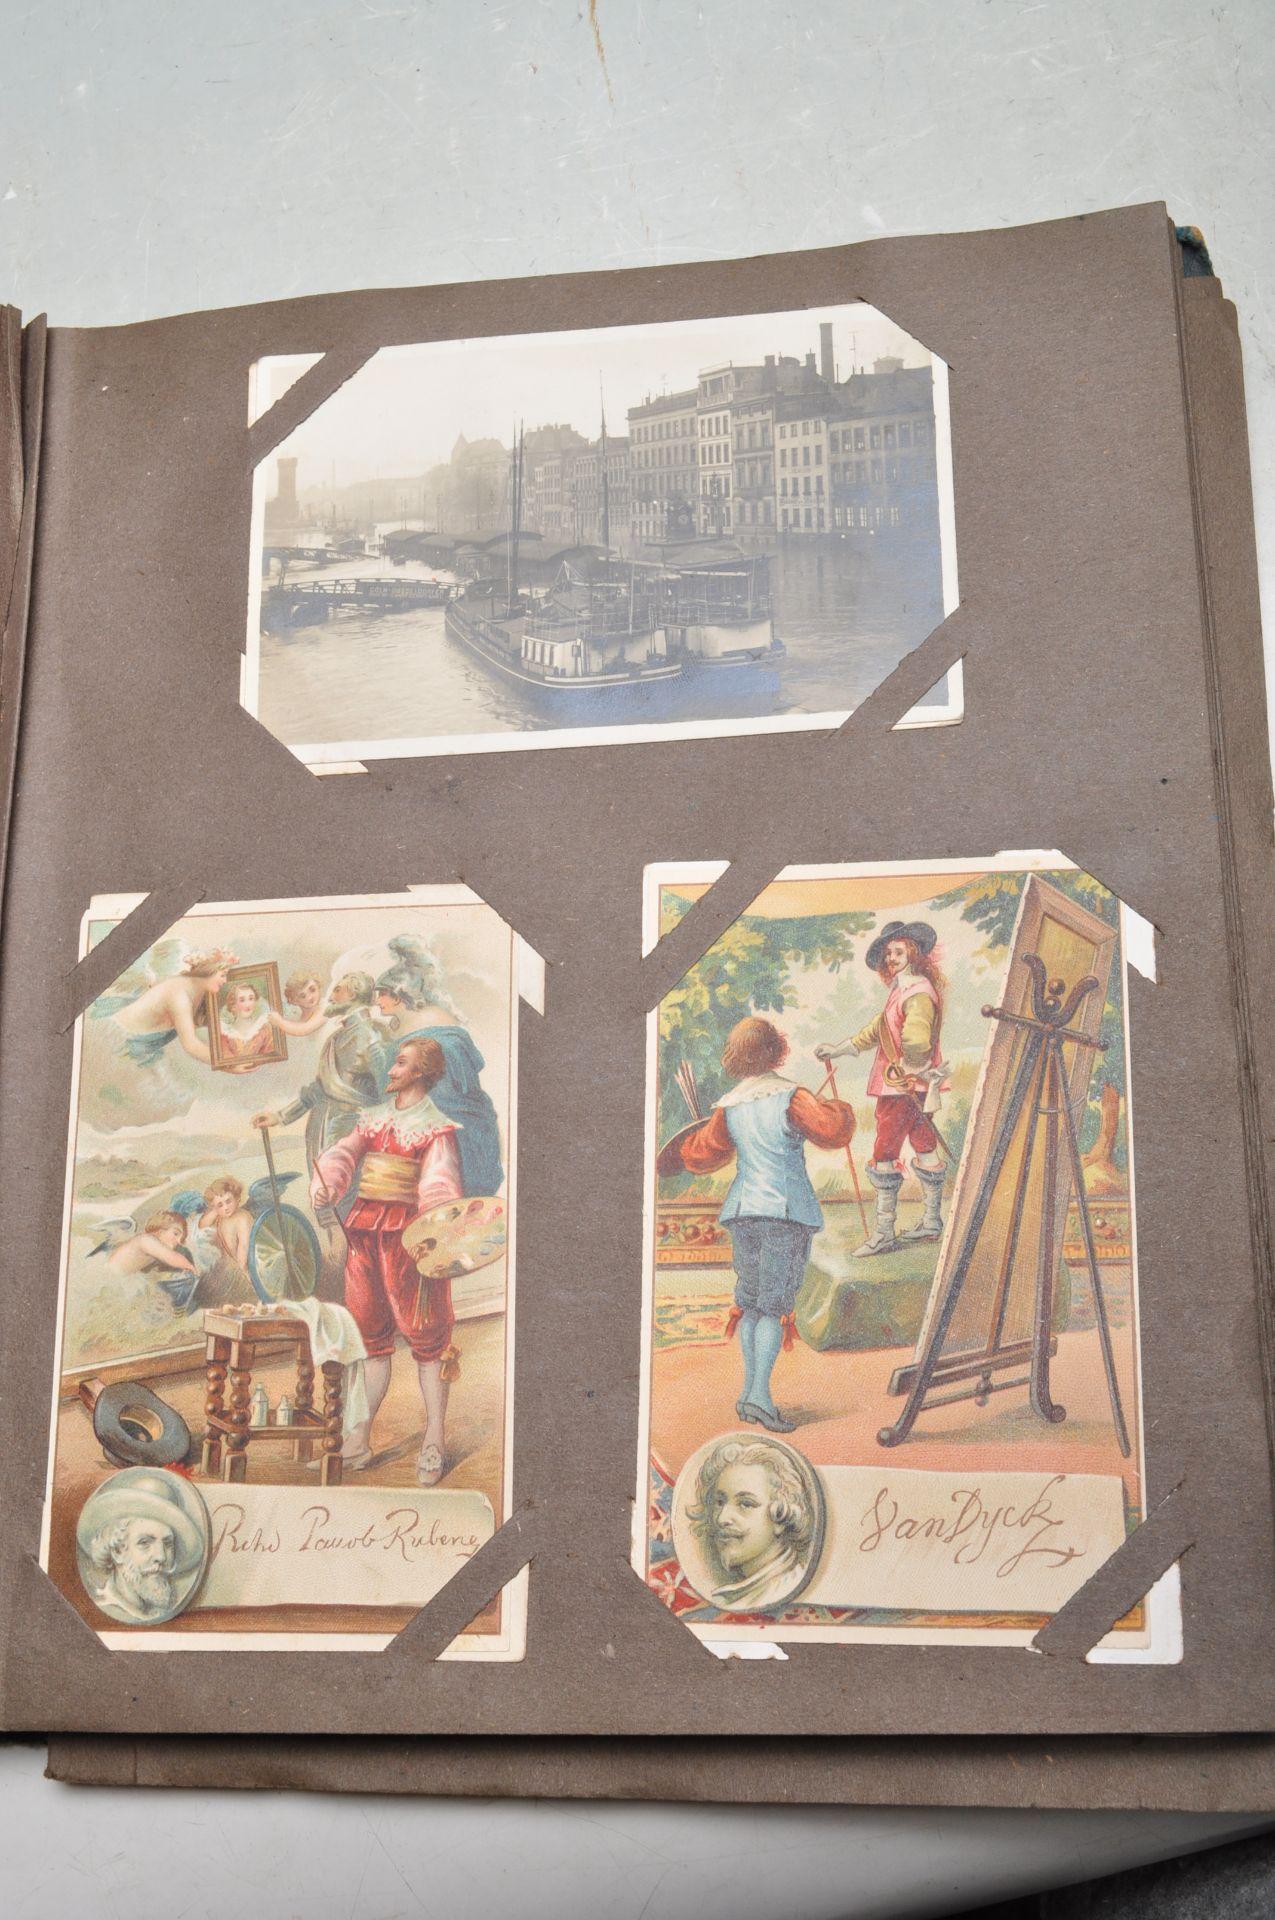 ALBUM OF FOREIGN POSTCARDS - ALL CIRCA WW1 PERIOD - Bild 18 aus 23